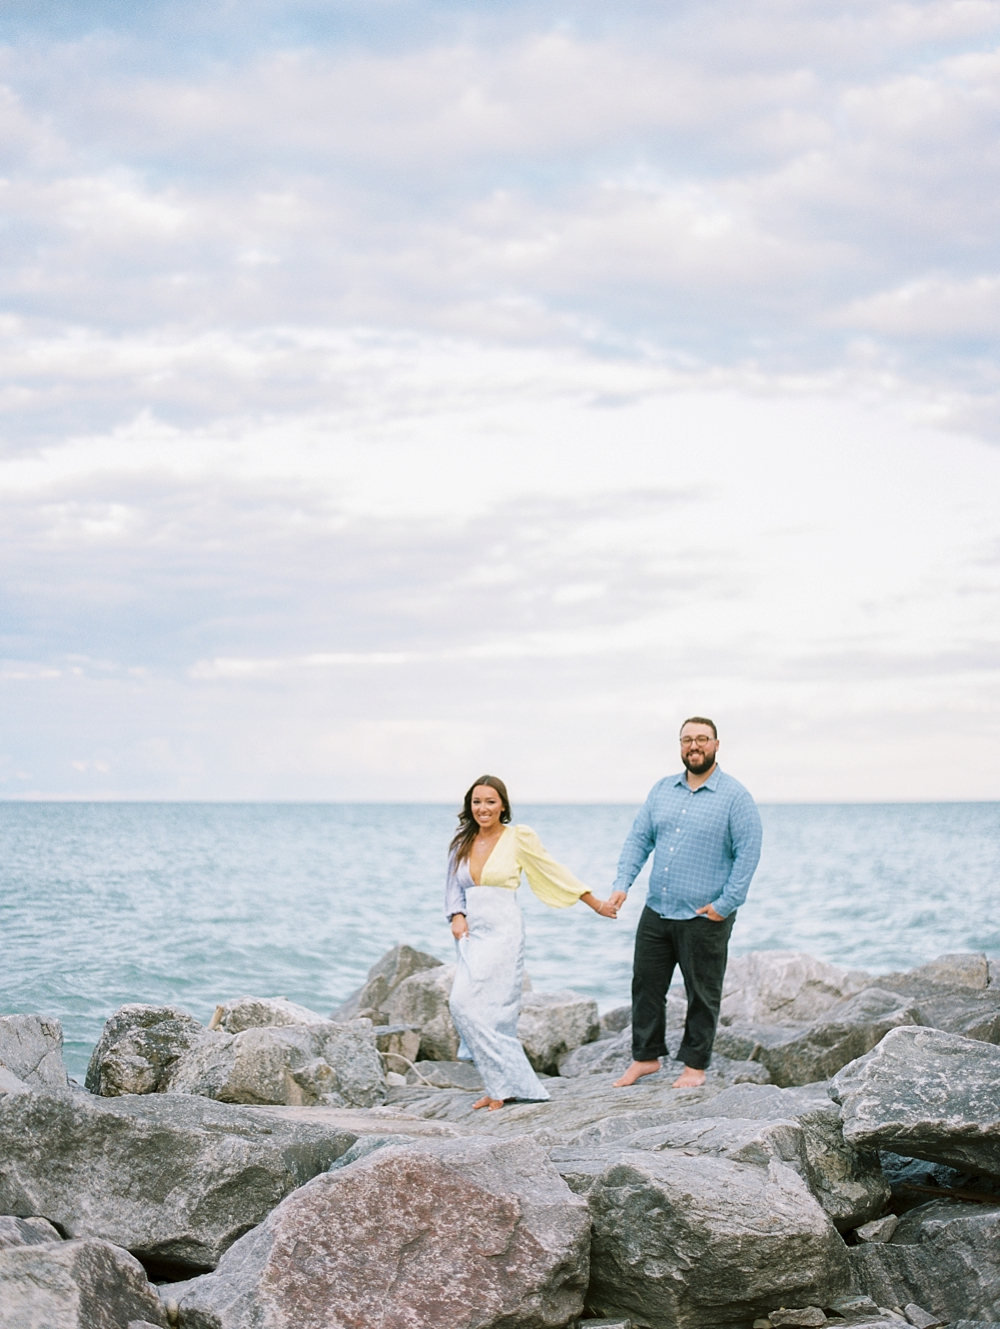 kristin-la-voie-photography-Chicago-Engagement-glencoe-beach-lake-michigan-3